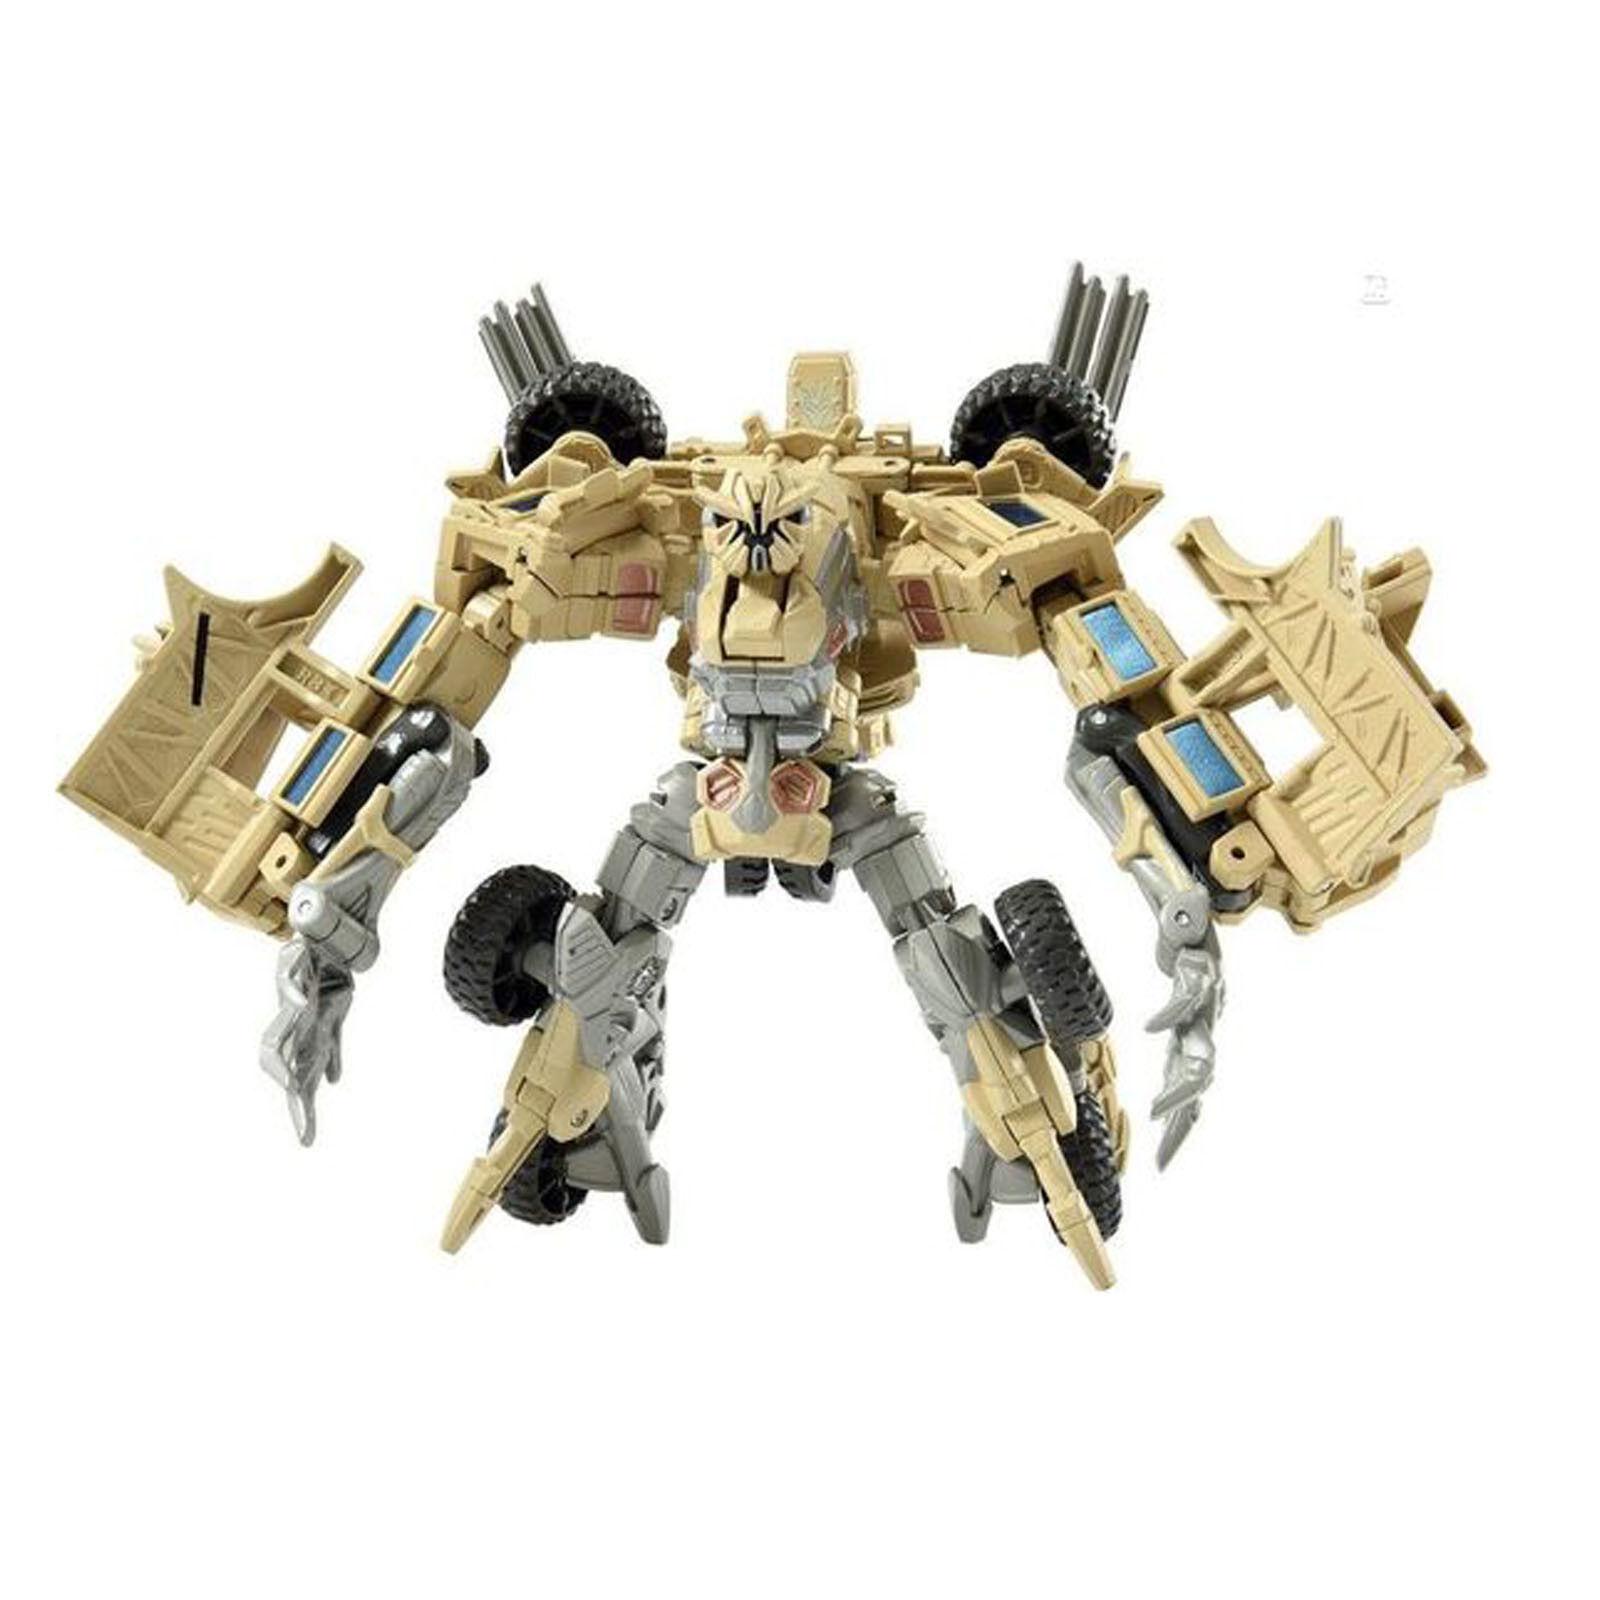 Transformers Movie The Best MB-13 MB13 BONECRUSHER Dulex Class Robot Gift